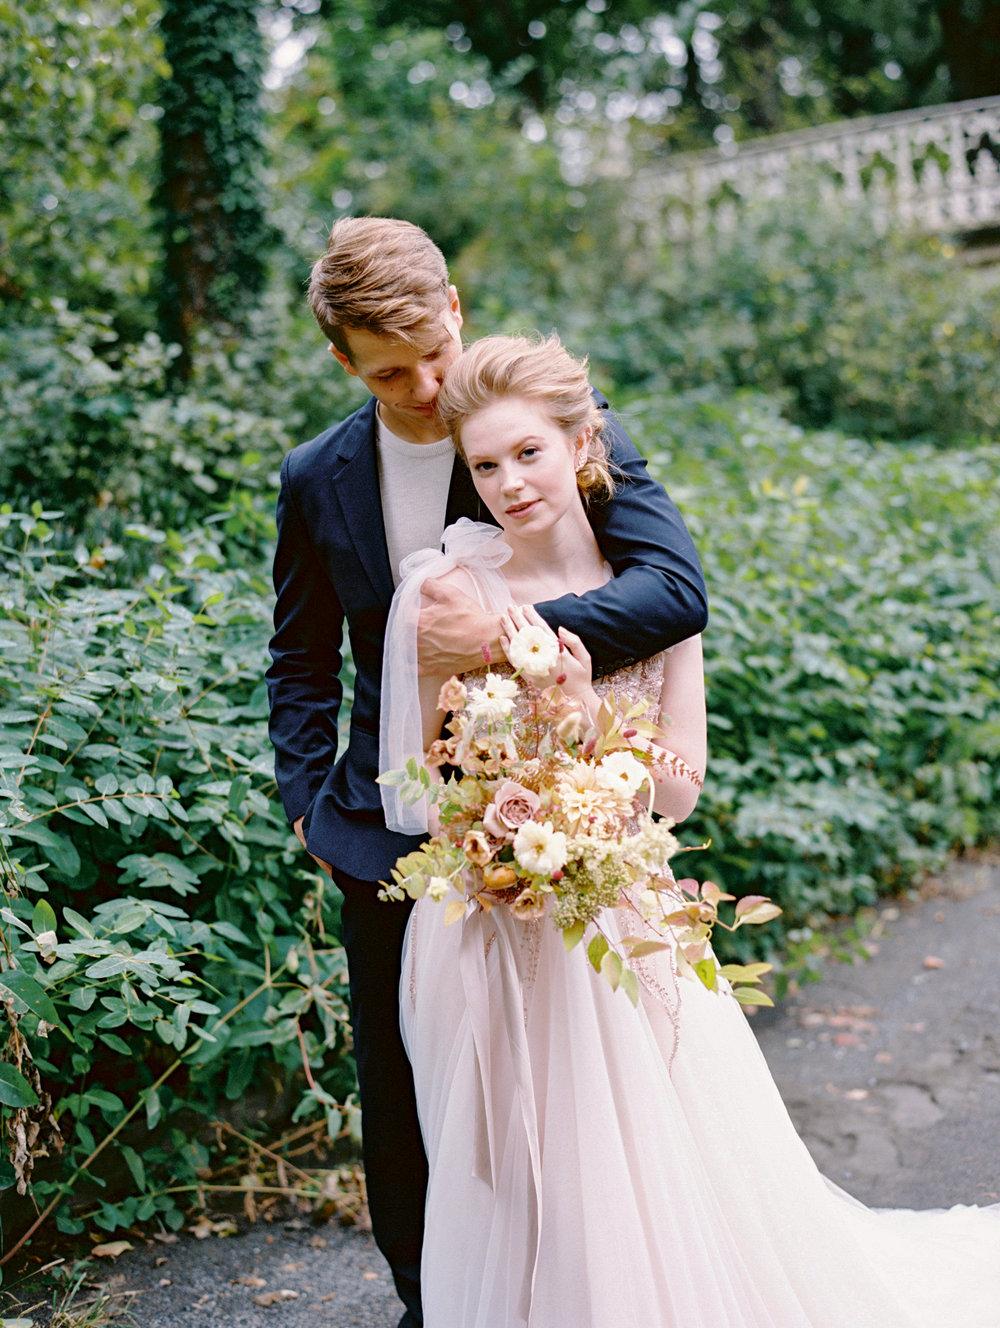 kelsandmichael_bridaleditorial_harvestelopement-68.jpg